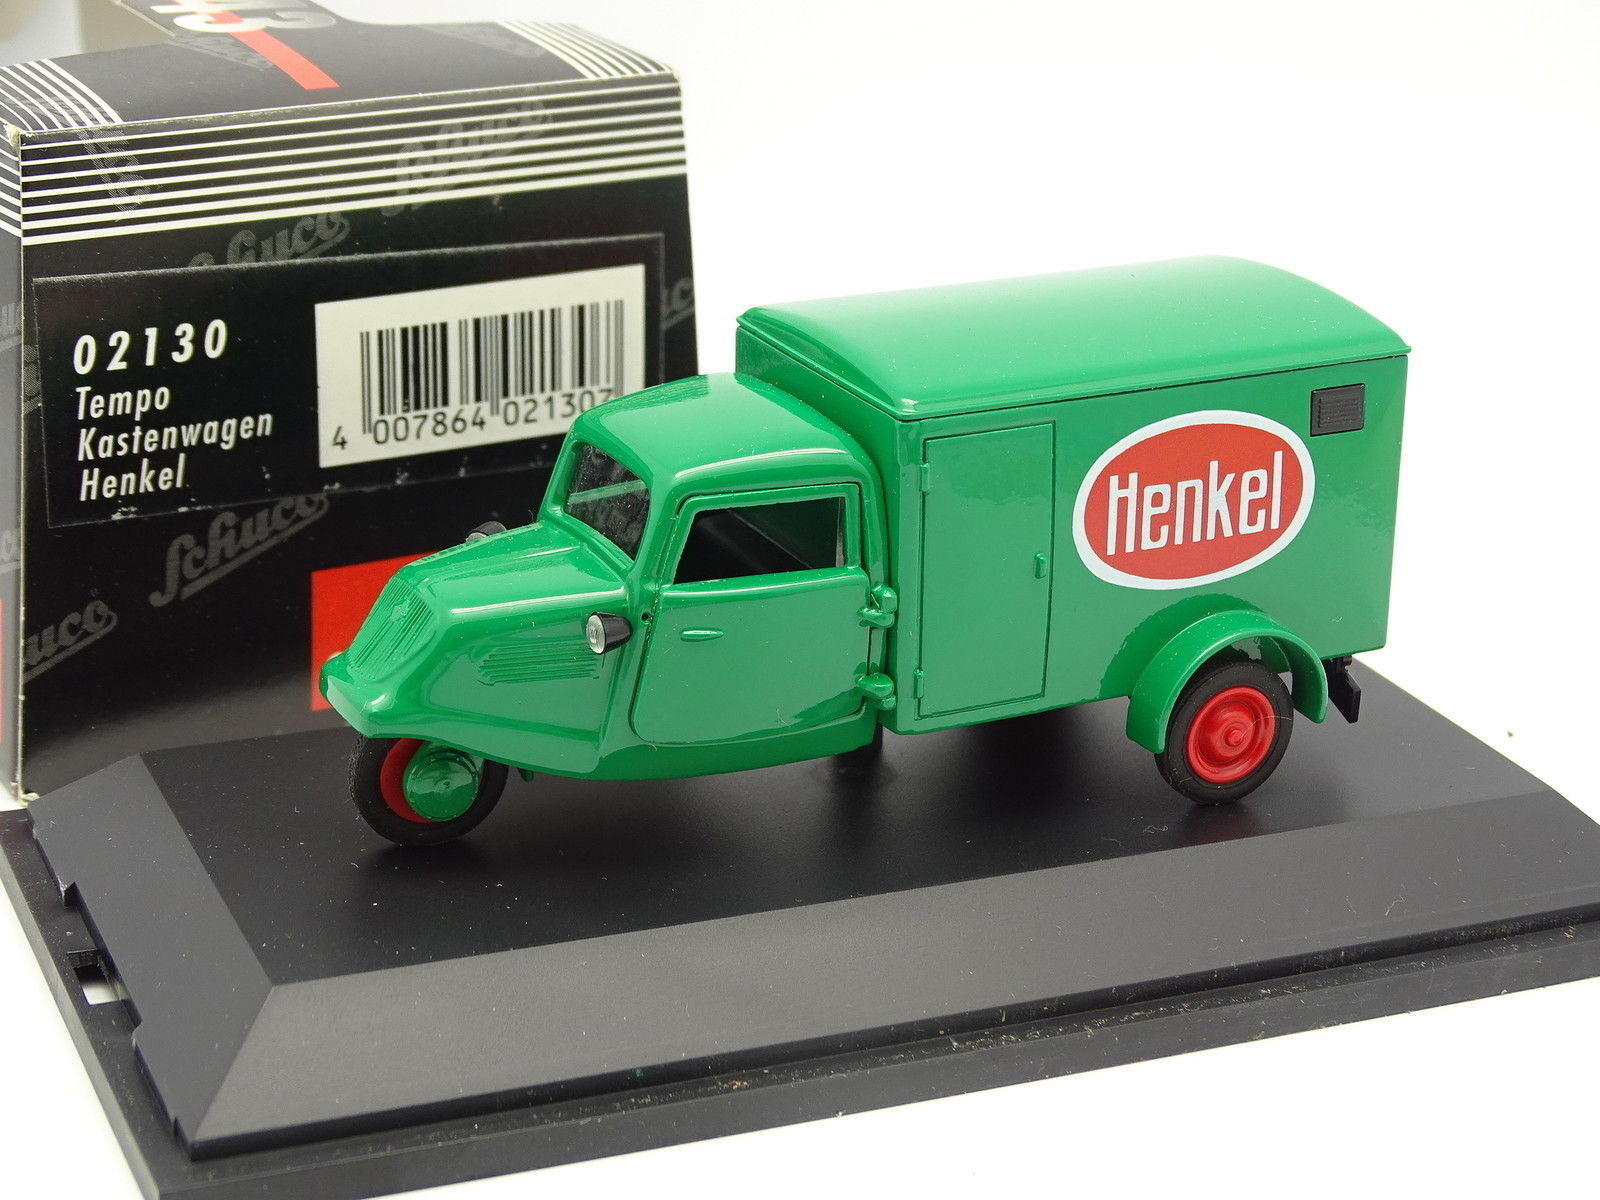 Schuco 1 43 - Tempo Kastenwagen Henkel